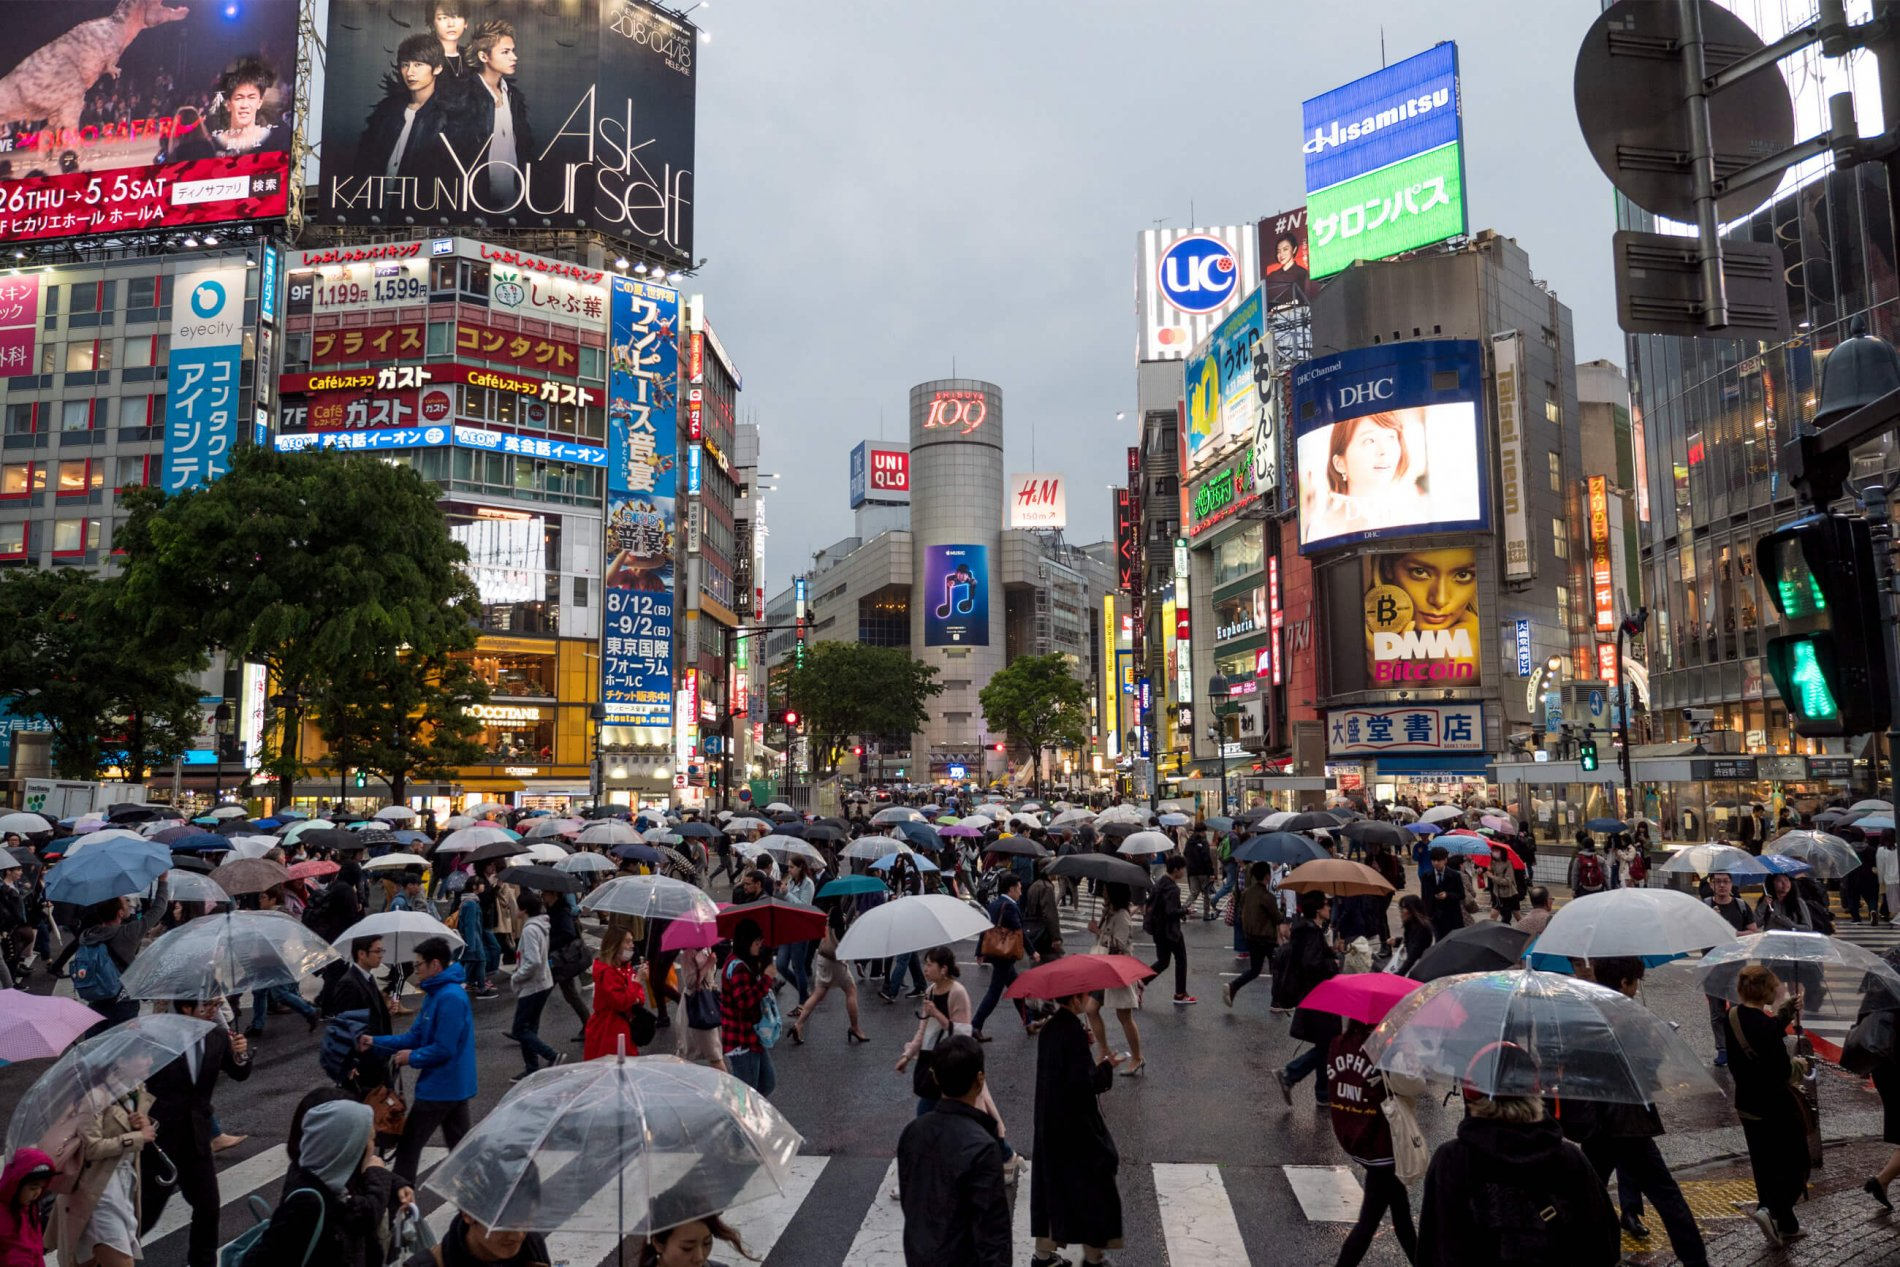 Najfrekventovanejšia križovatka na svete v časti Shibuya. foto   Martin  ŠIMKO… e55eadd1576